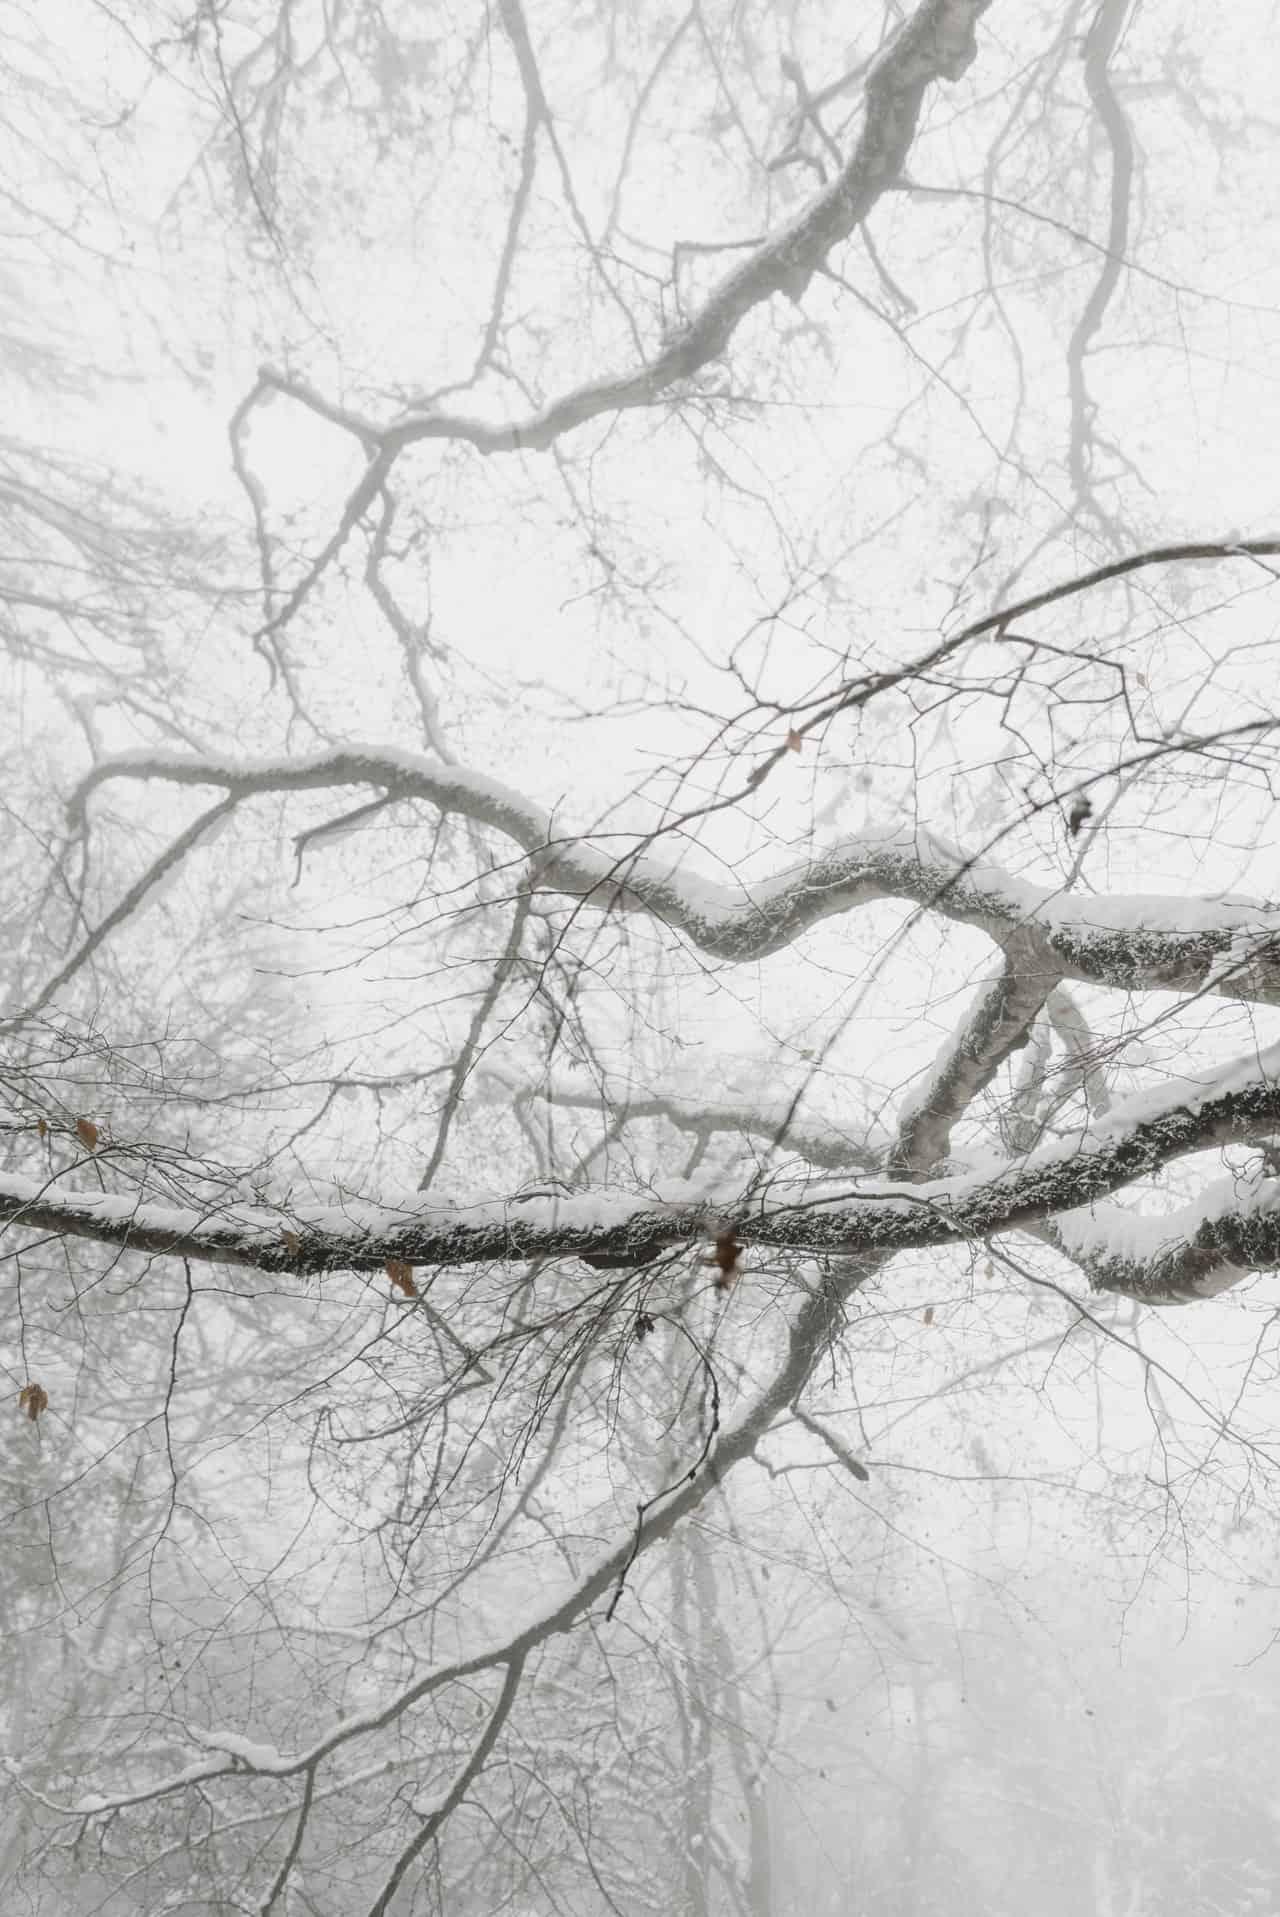 Mist en kou in winterbos